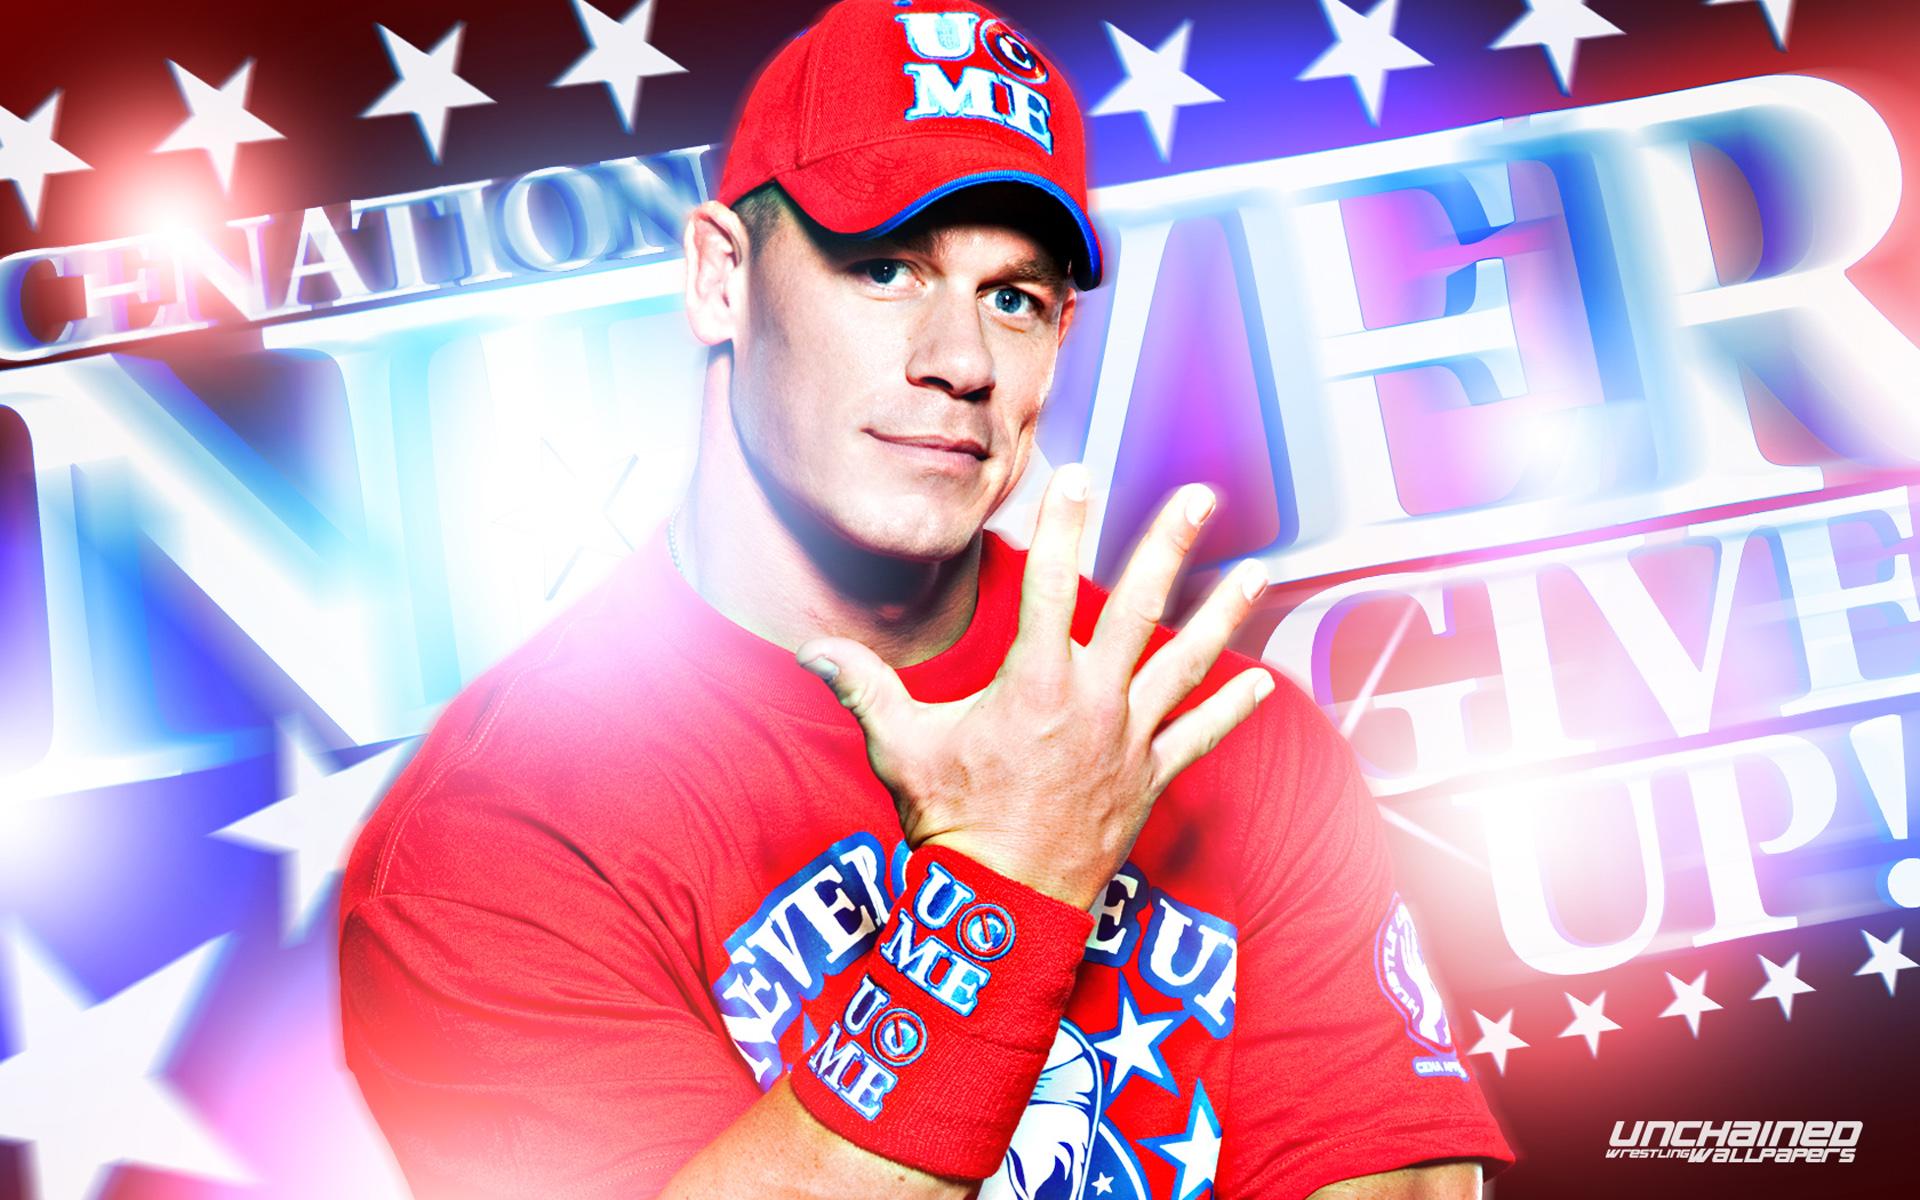 John Cena Wallpapers Celebrity Hq John Cena Pictures 4k Wallpapers 2019